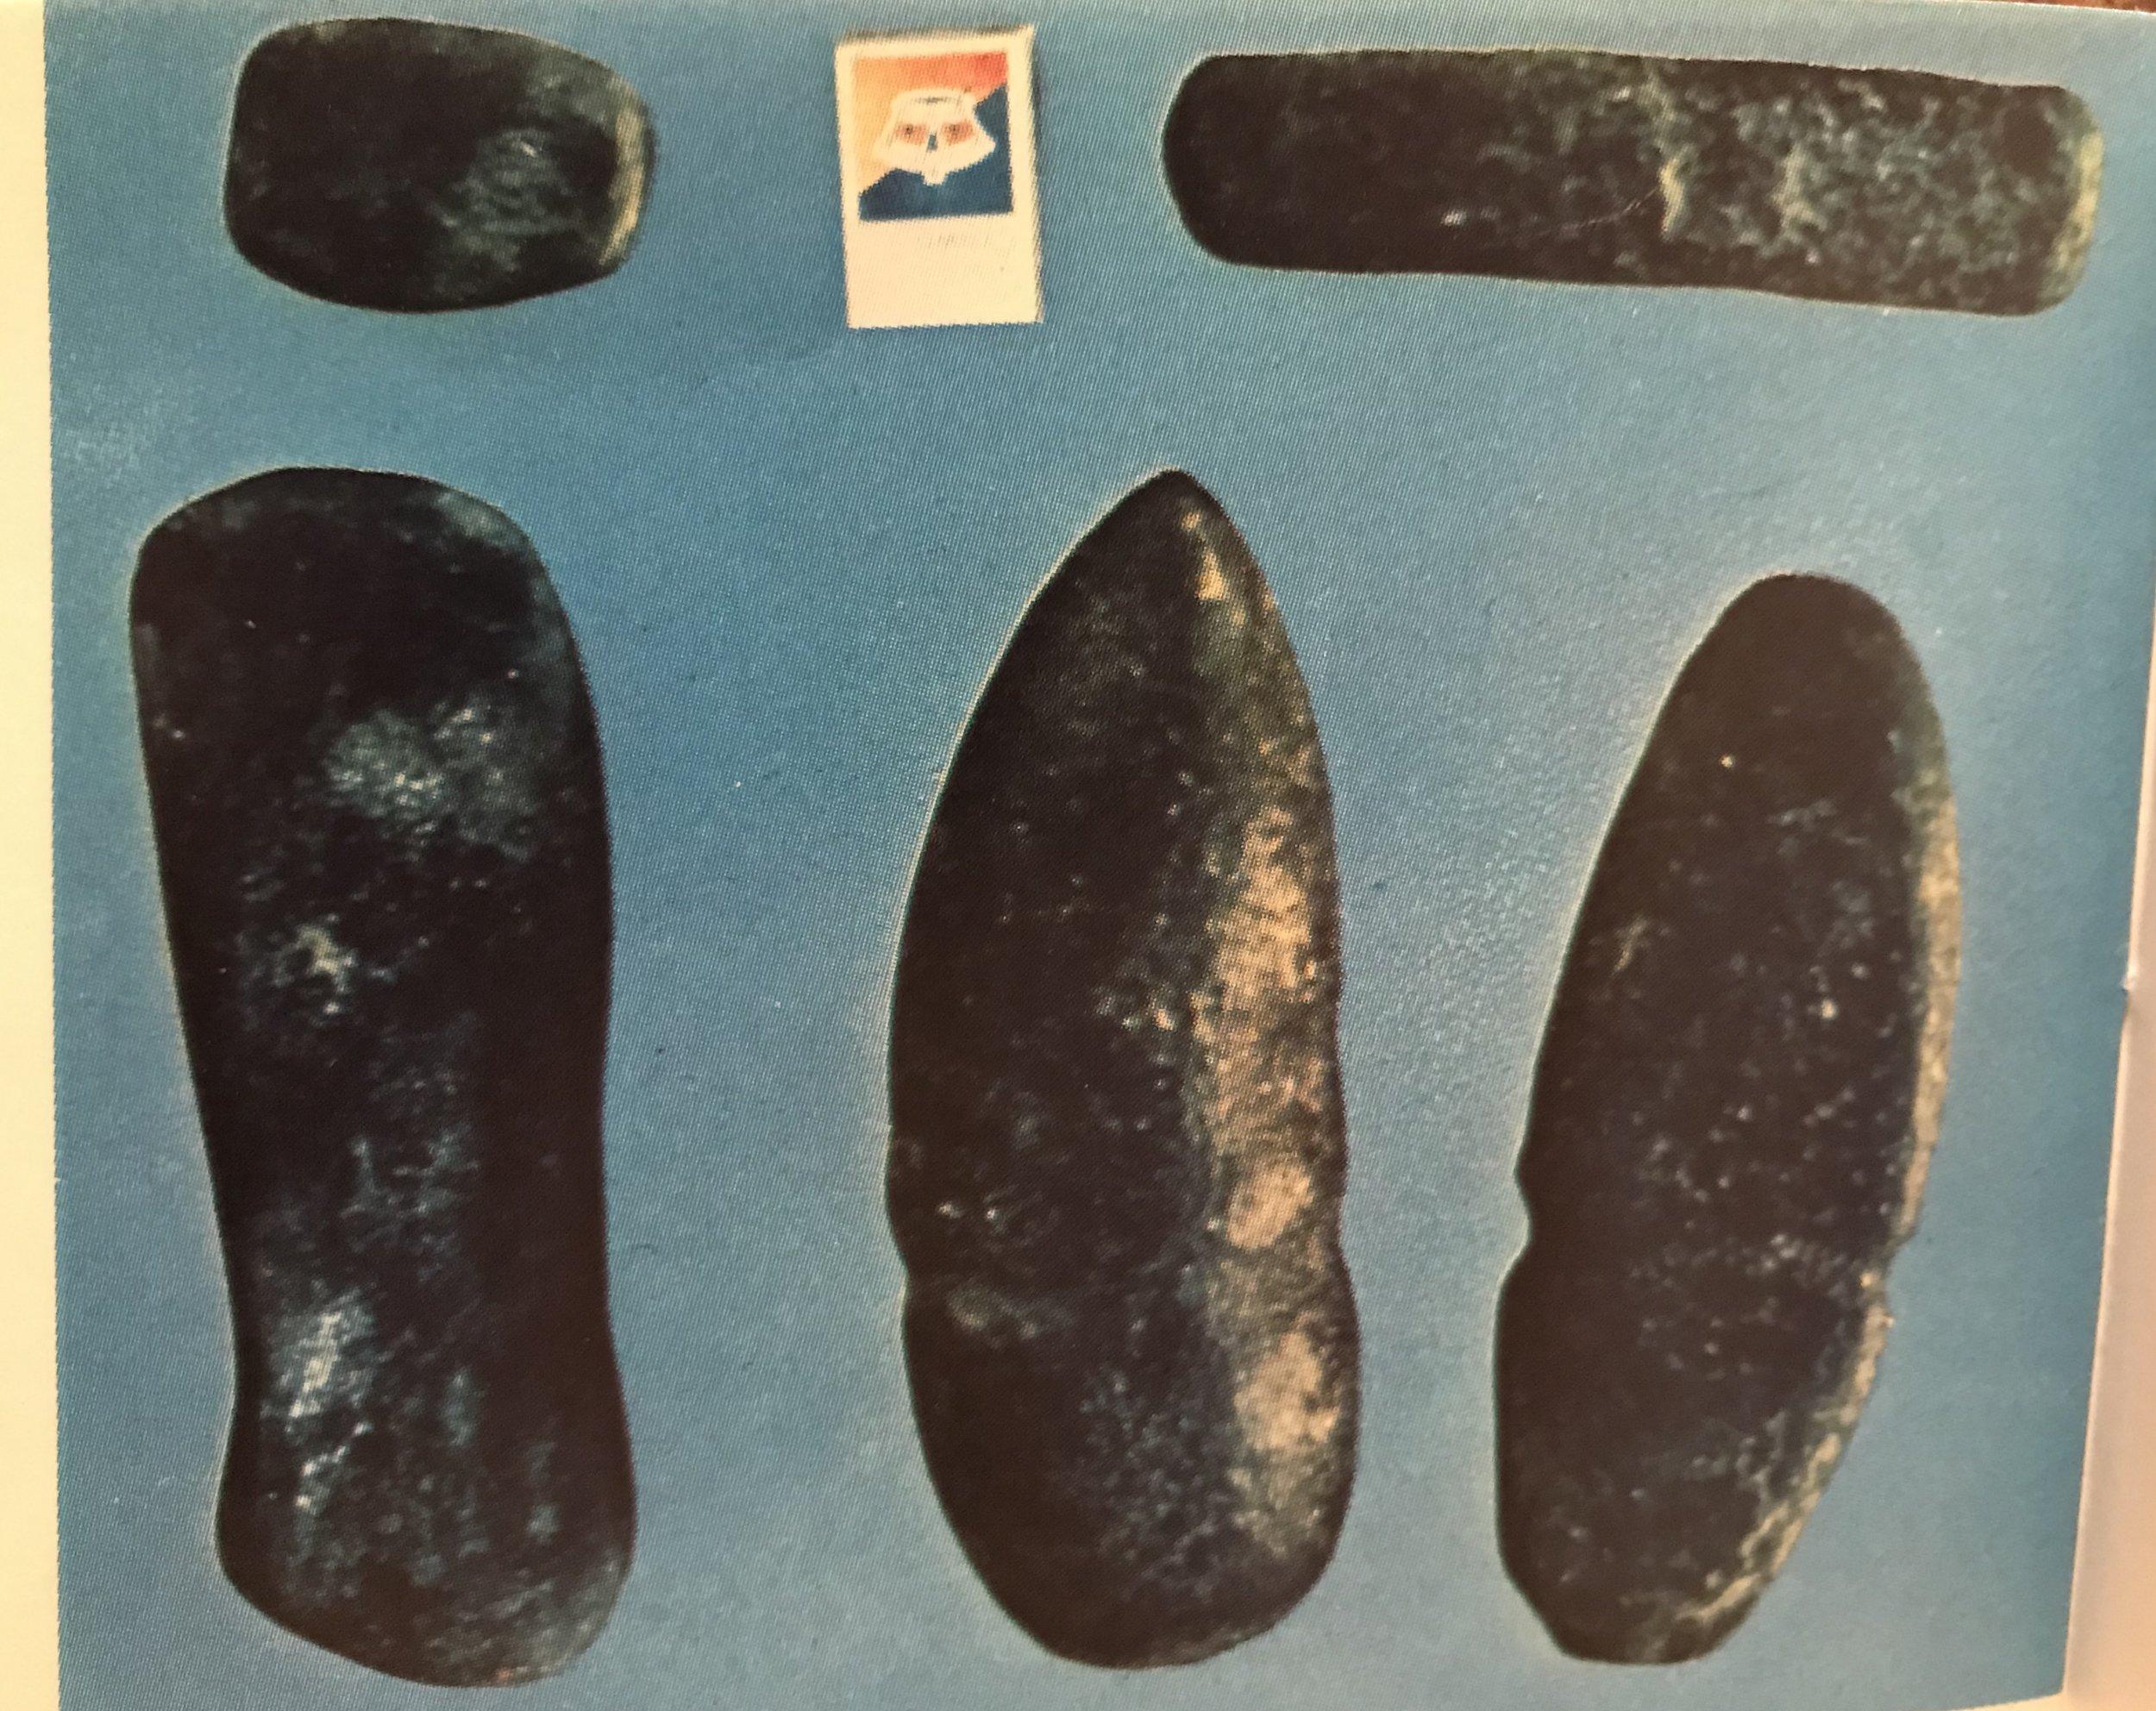 Avoca axes diorite 2.5kg.jpg